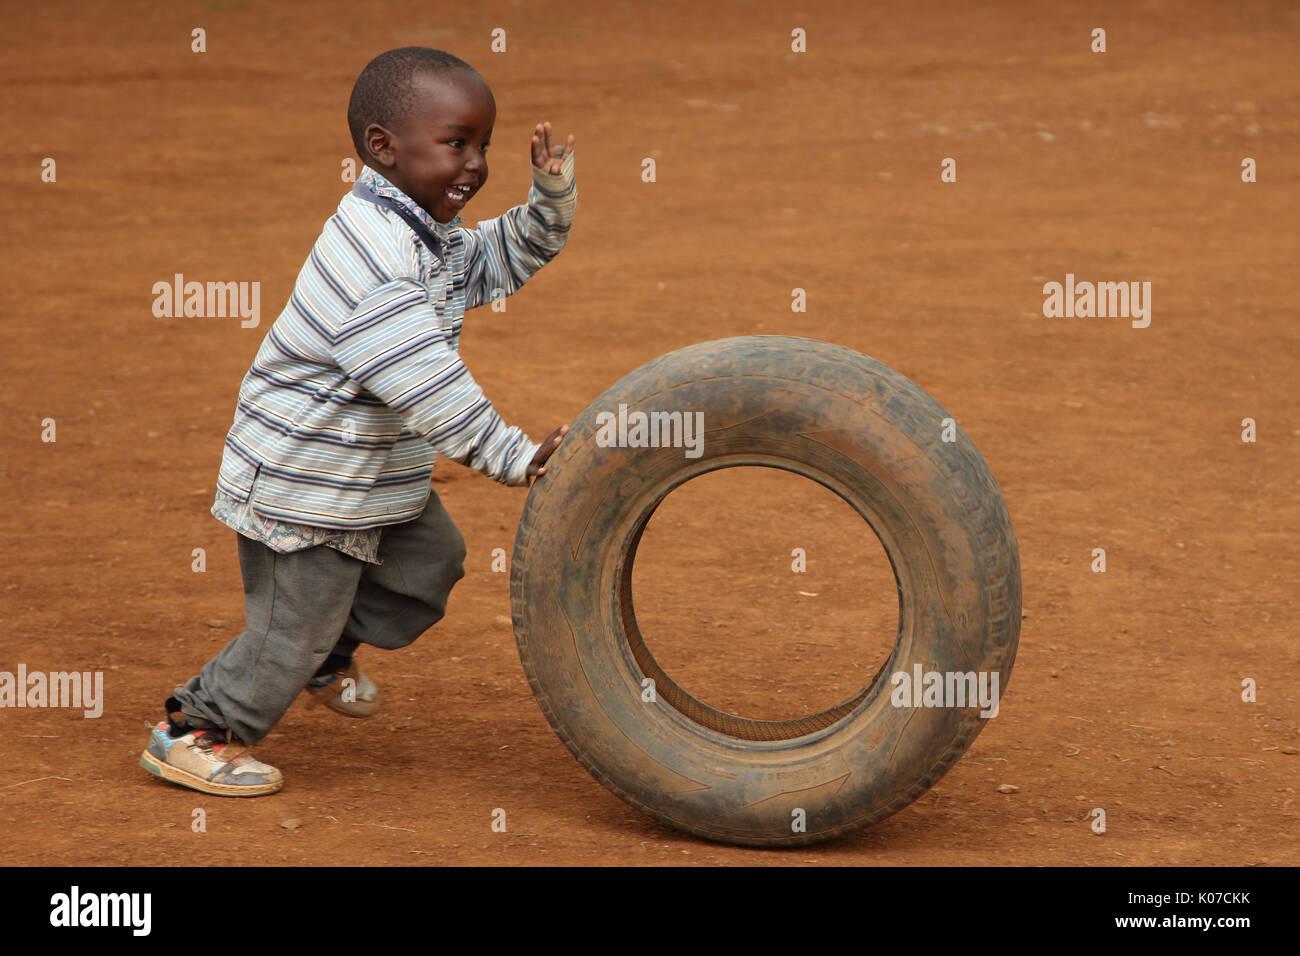 Child playing with tire, near Eldoret, Kenya, Kalingen tribal area Stock Photo